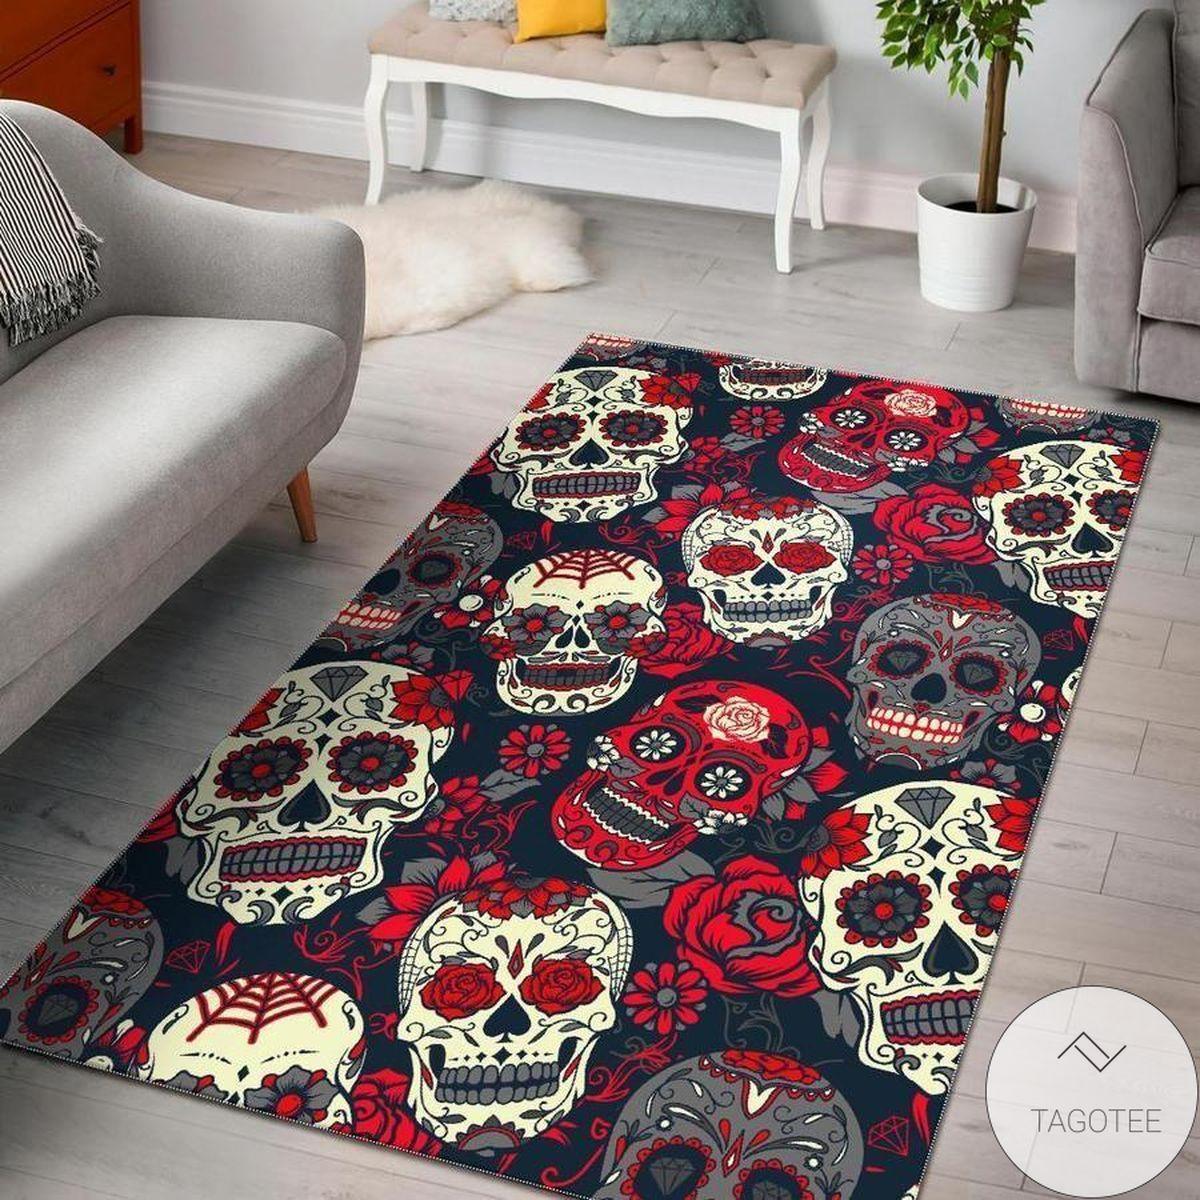 Great artwork! White Red Sugar Skull Area Rug